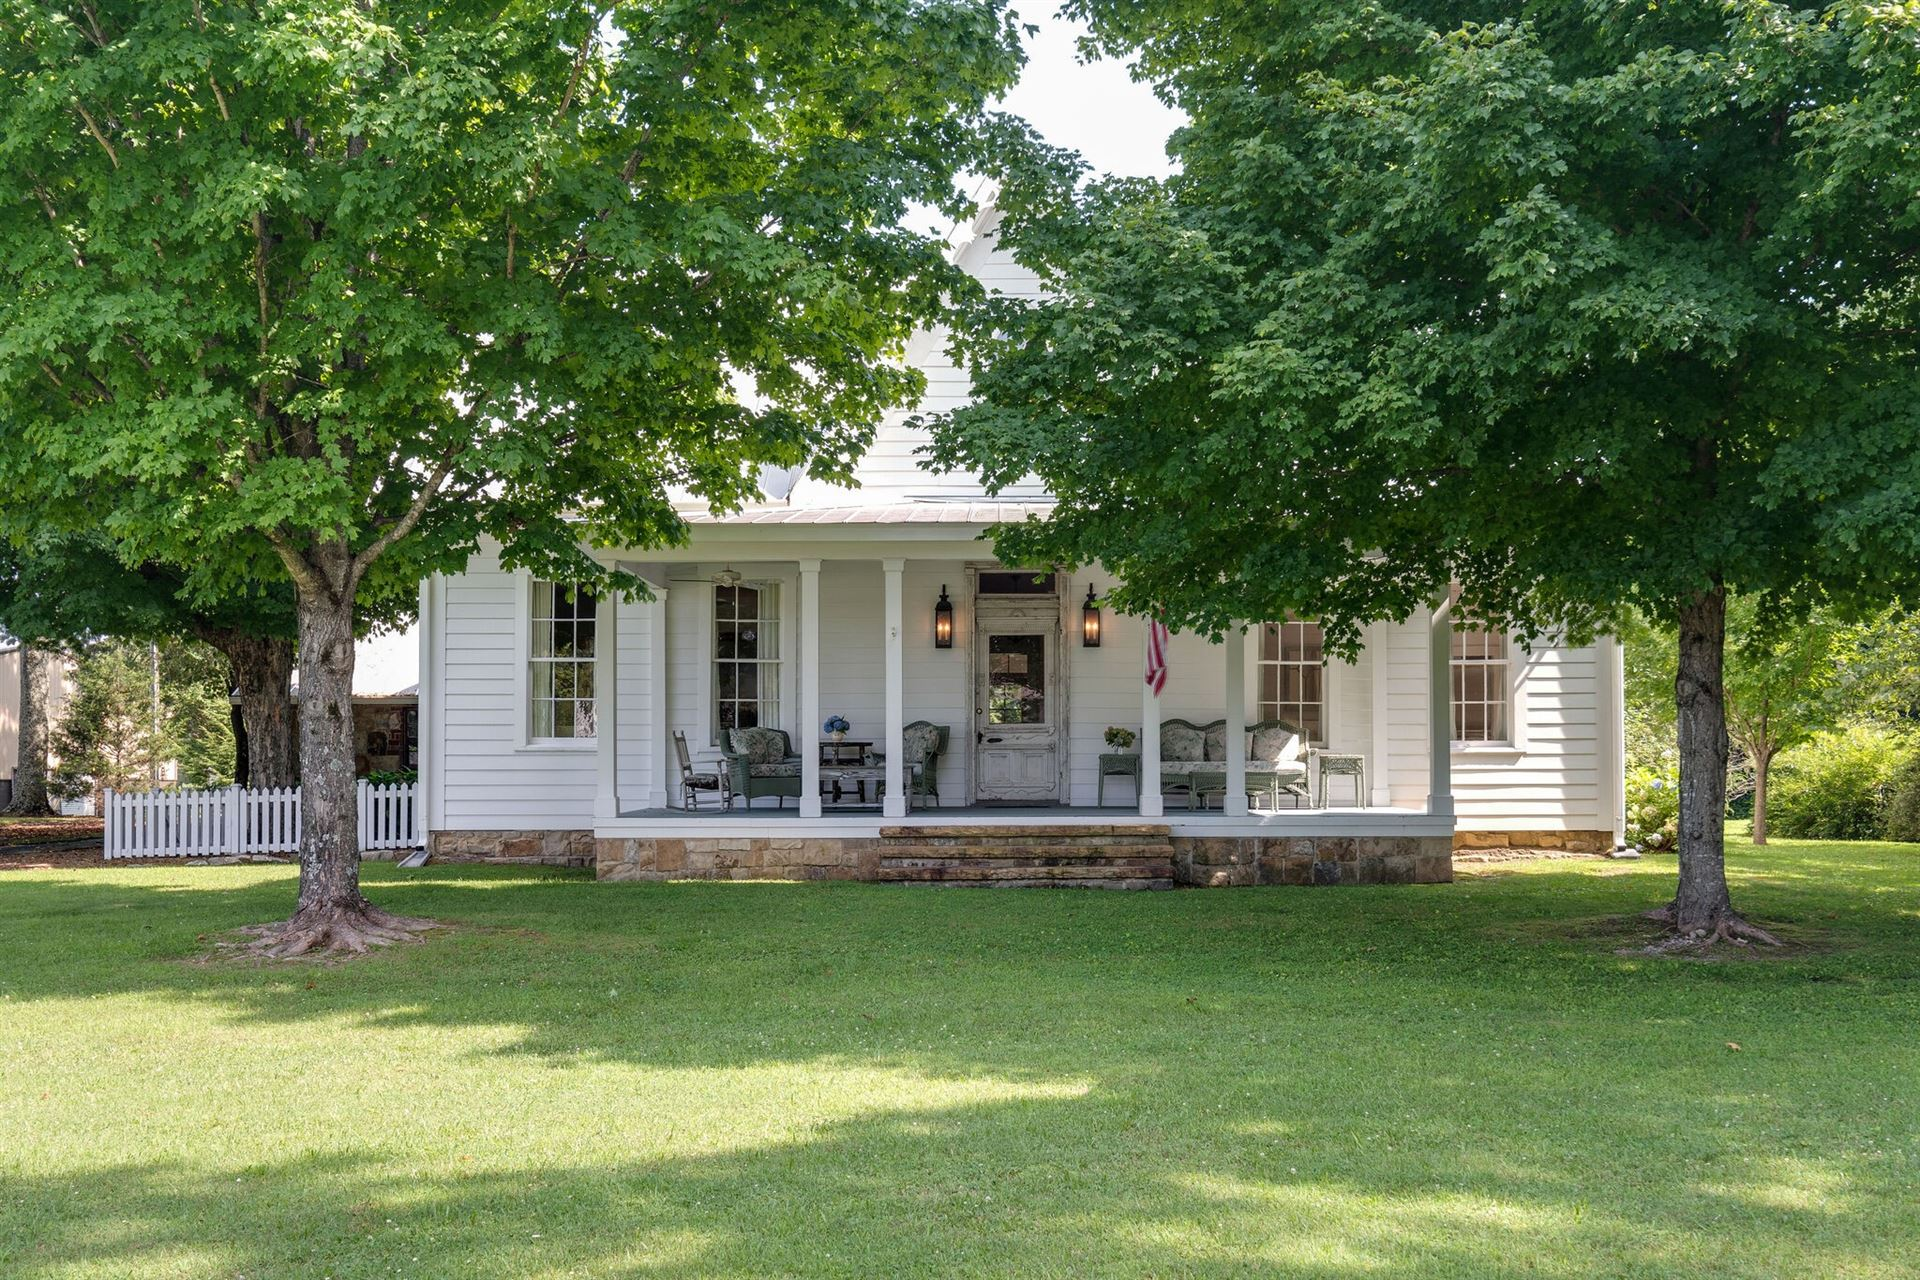 363 College St, Monteagle, TN 37356 - MLS#: 2277489